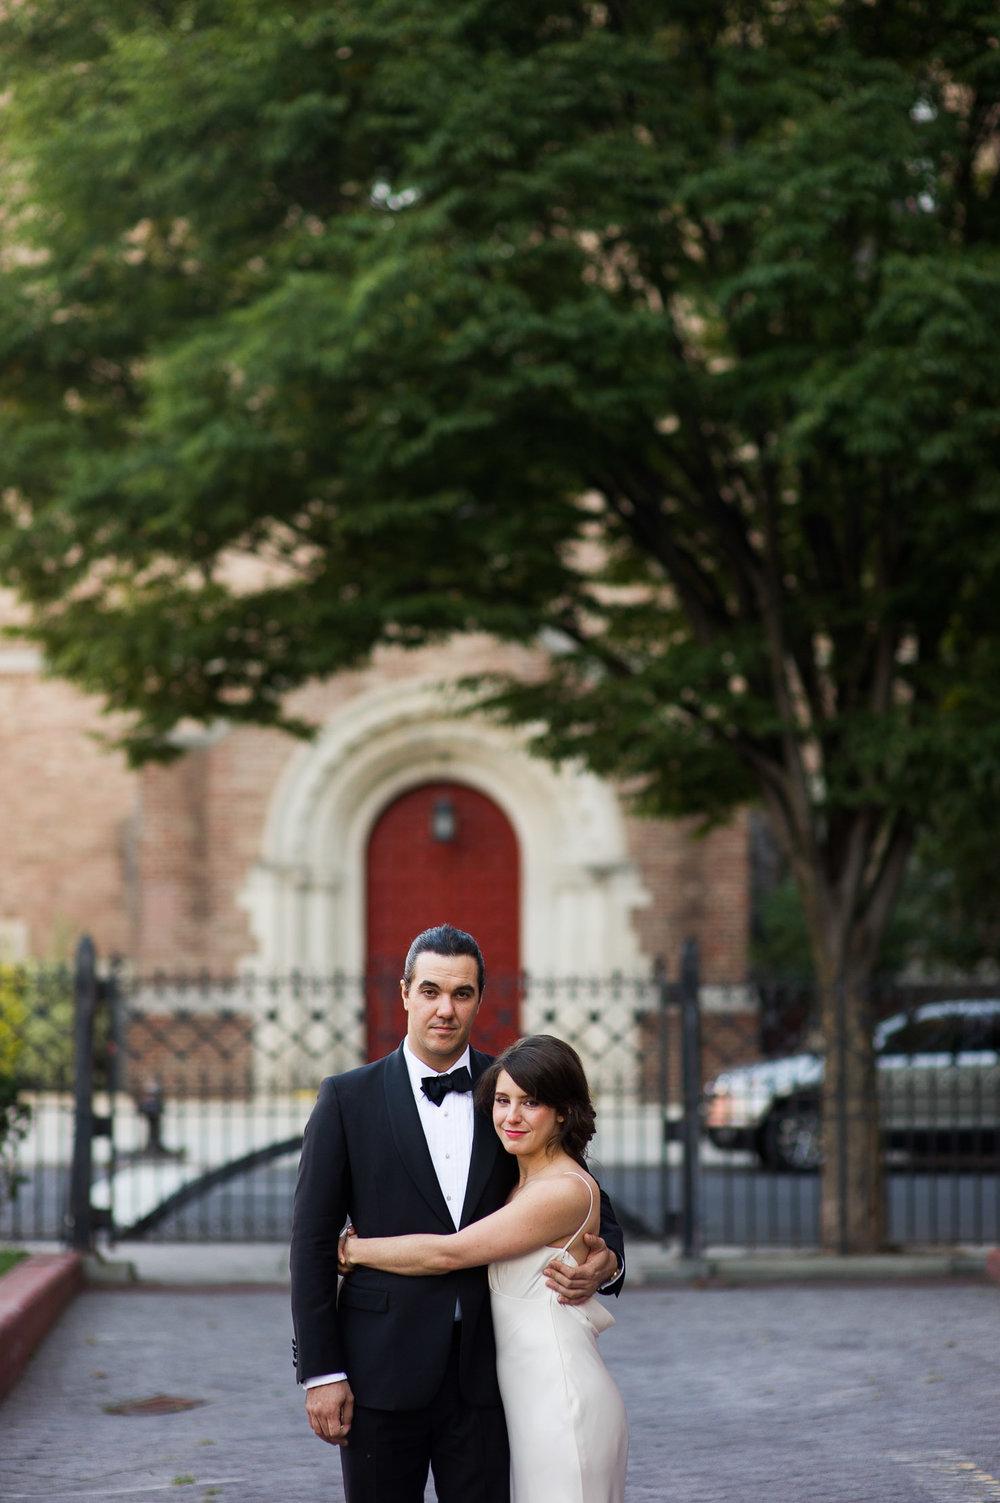 Ici-Brooklyn-Wedding-1023.jpg